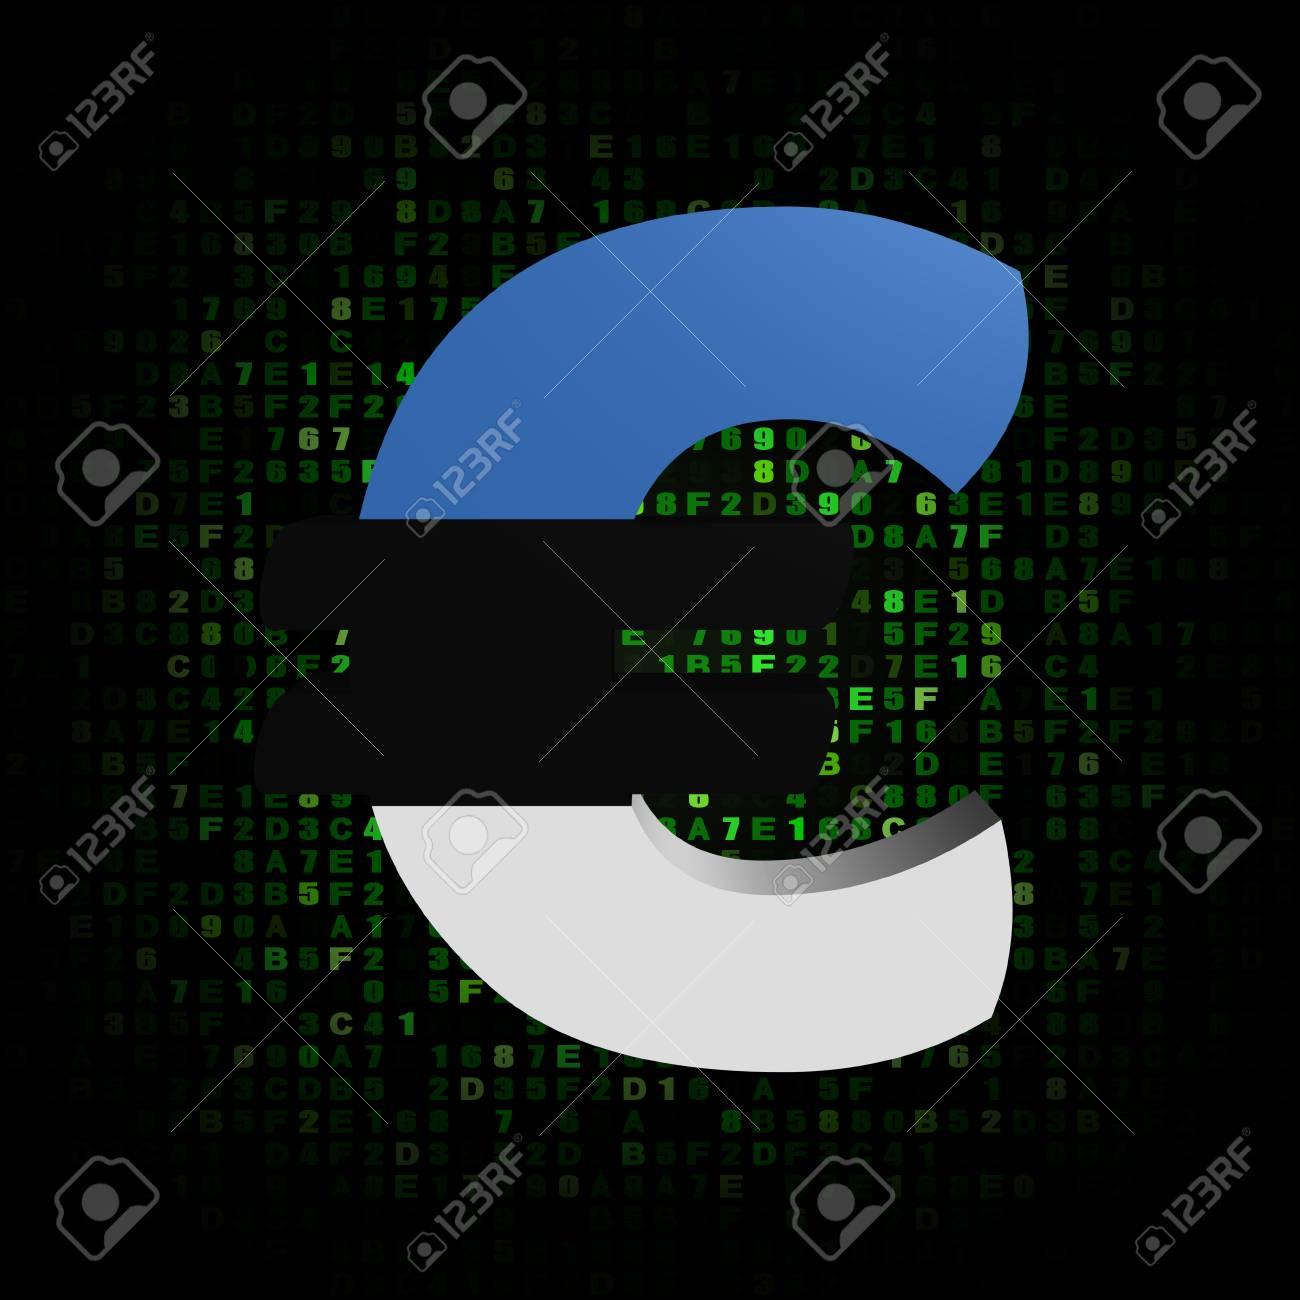 Euro Symbol With Estonian Flag On Hex Code Illustration Stock Photo